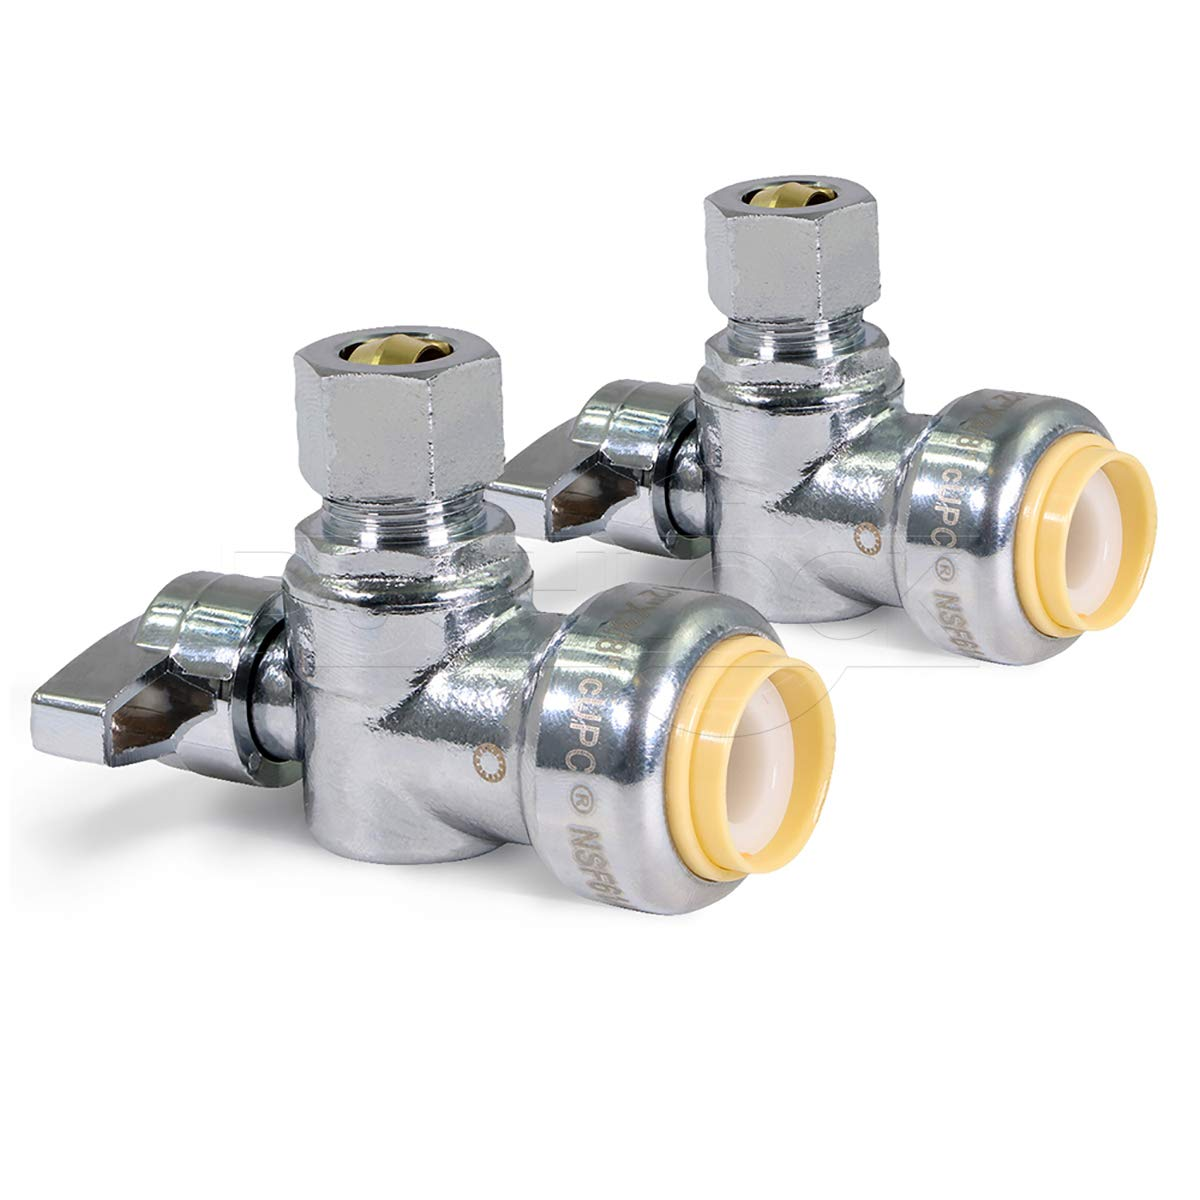 Pushlock UPASC1214-2 1/4 Turn Angle Stop Valve Water Shut Off 1/2 Push x 1/4 Inch Compression Chrome